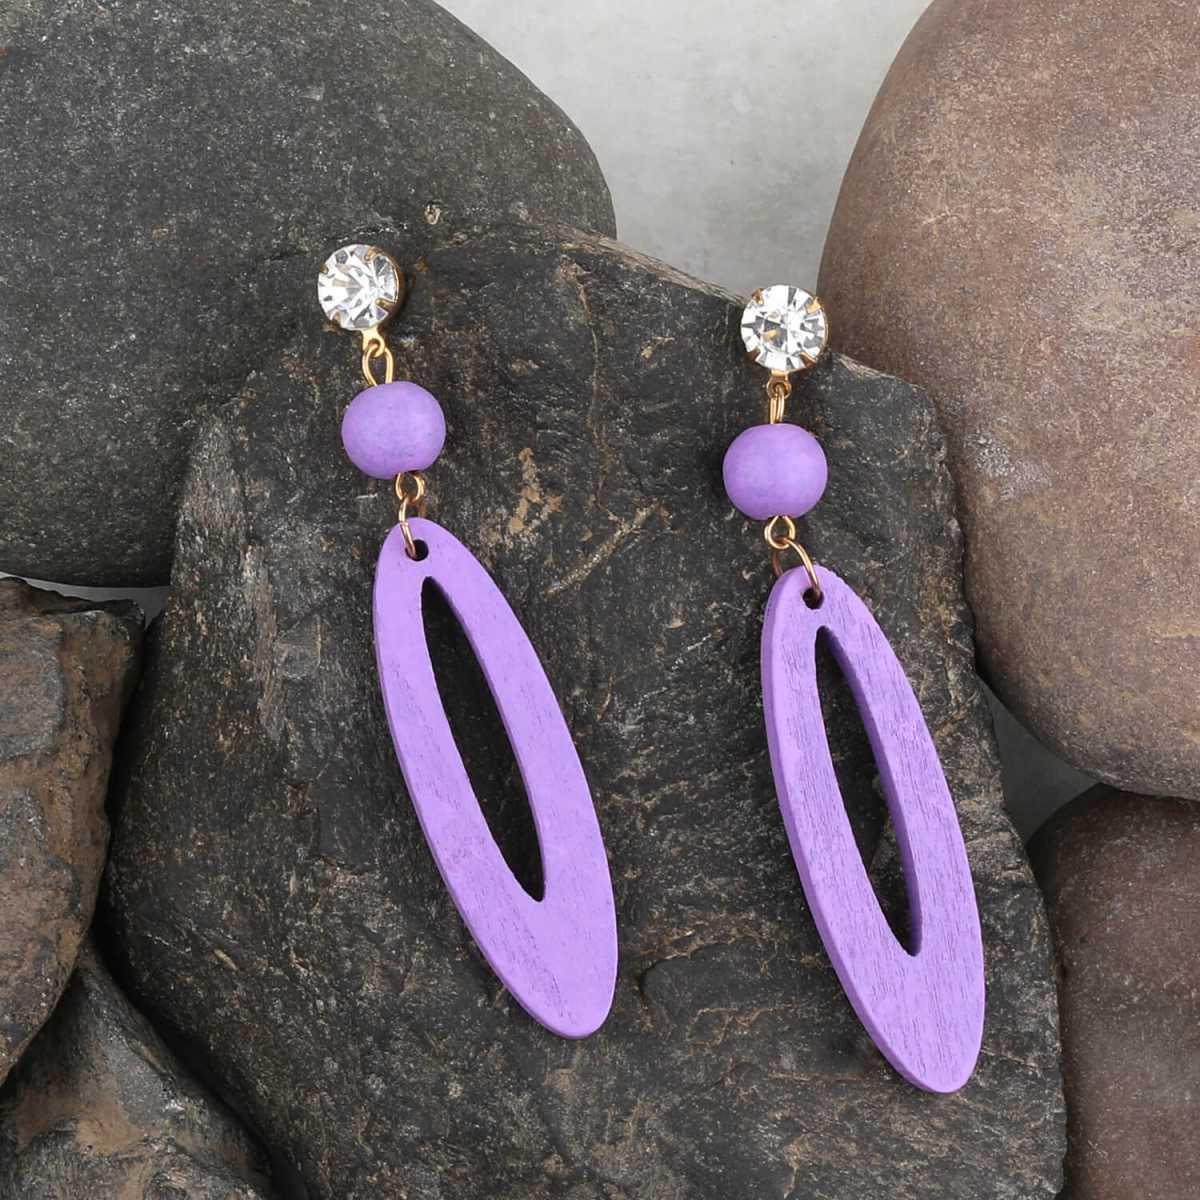 SILVER SHINE Fashion Earring Designer Dangler Purple Wooden Light Weight Earrings for Girls and Women.